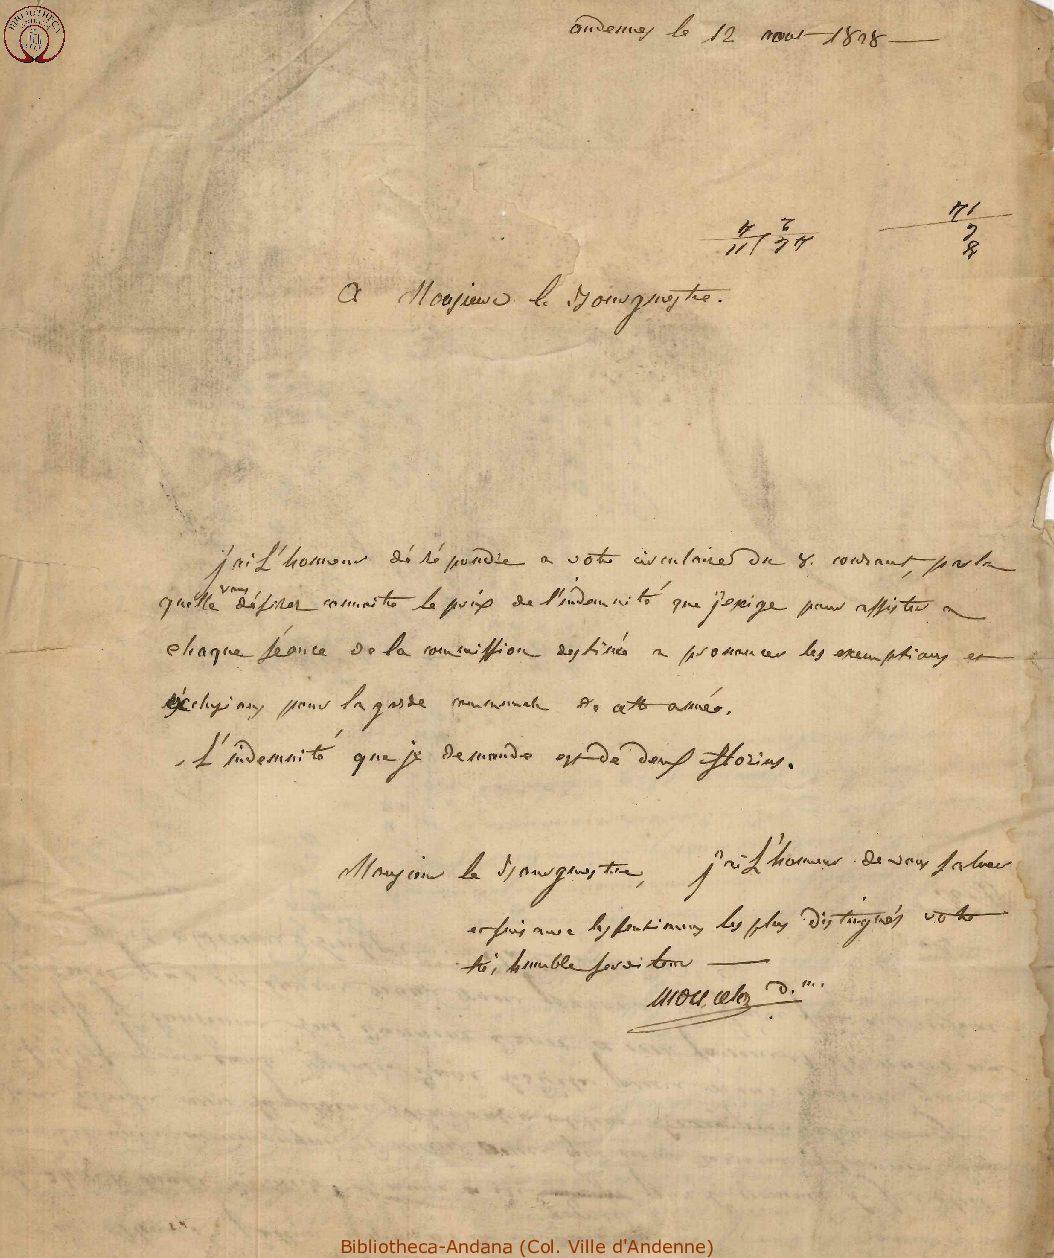 1818-08-12